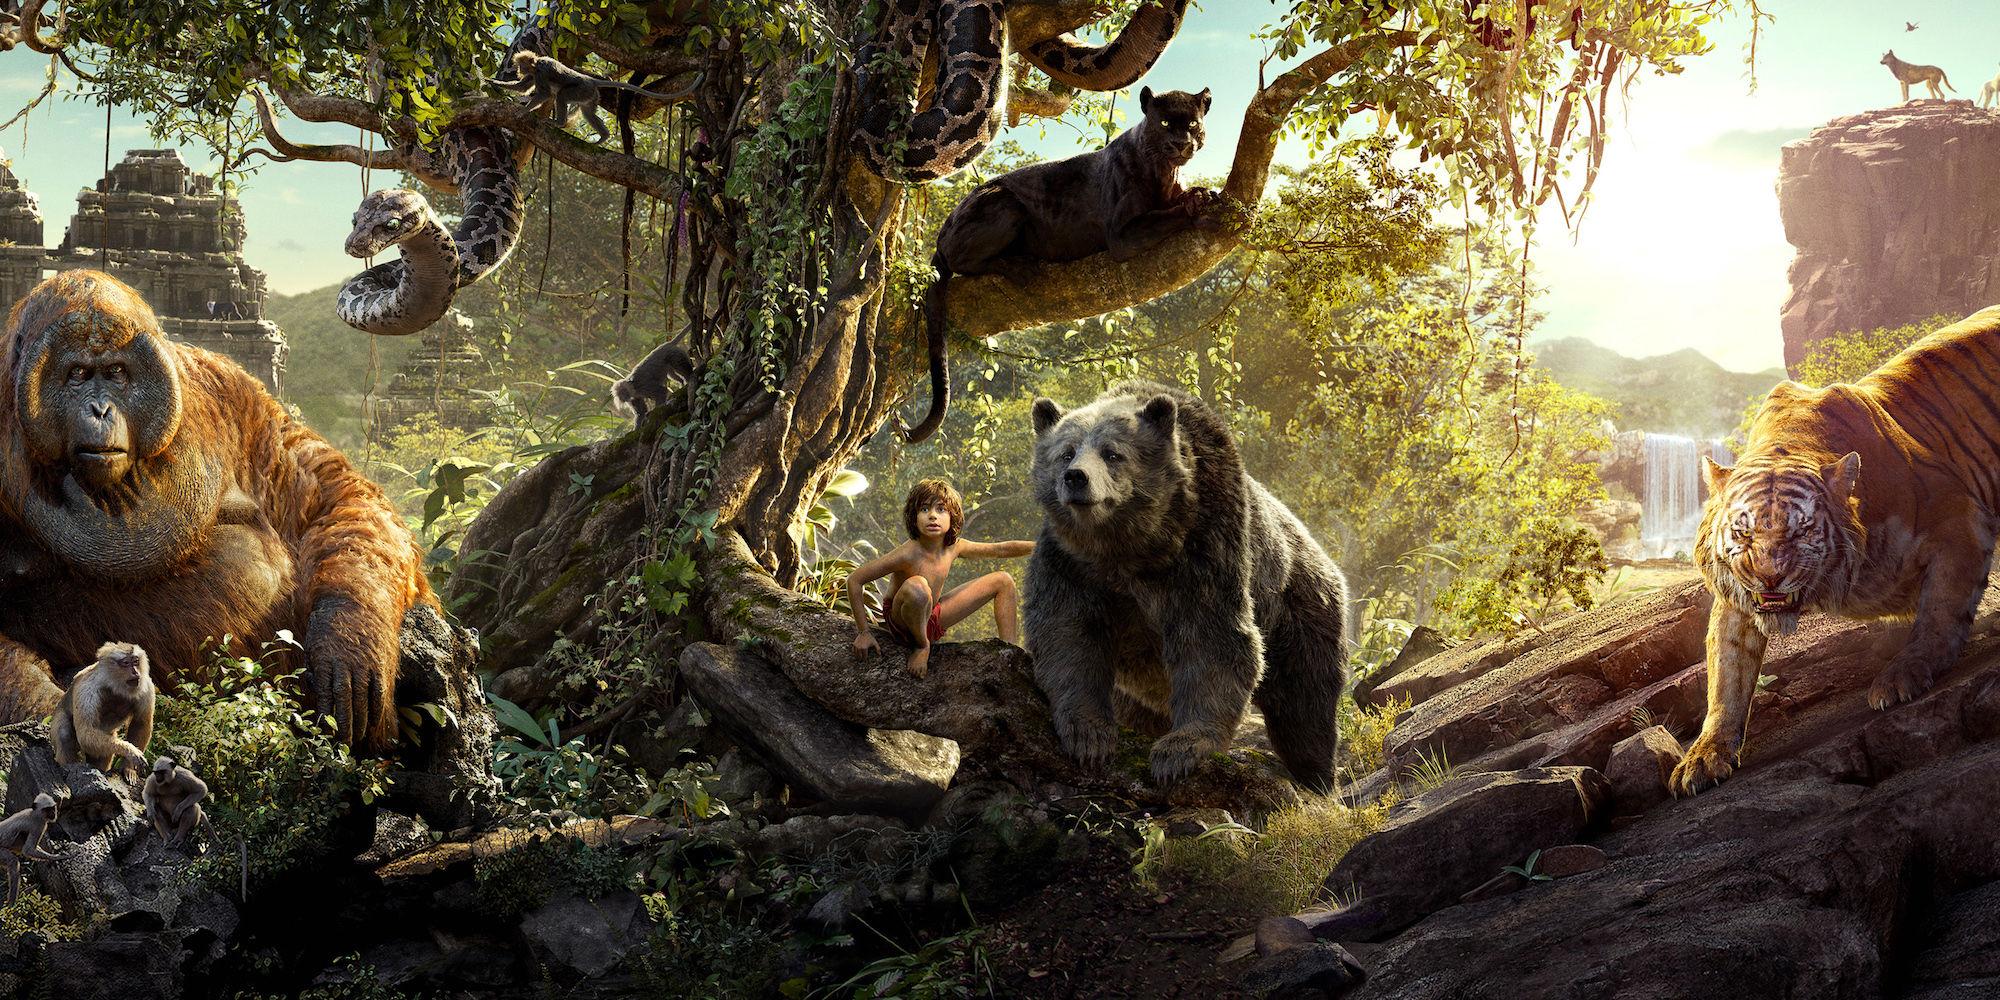 The-Jungle-Book-Movie-Cast-2016